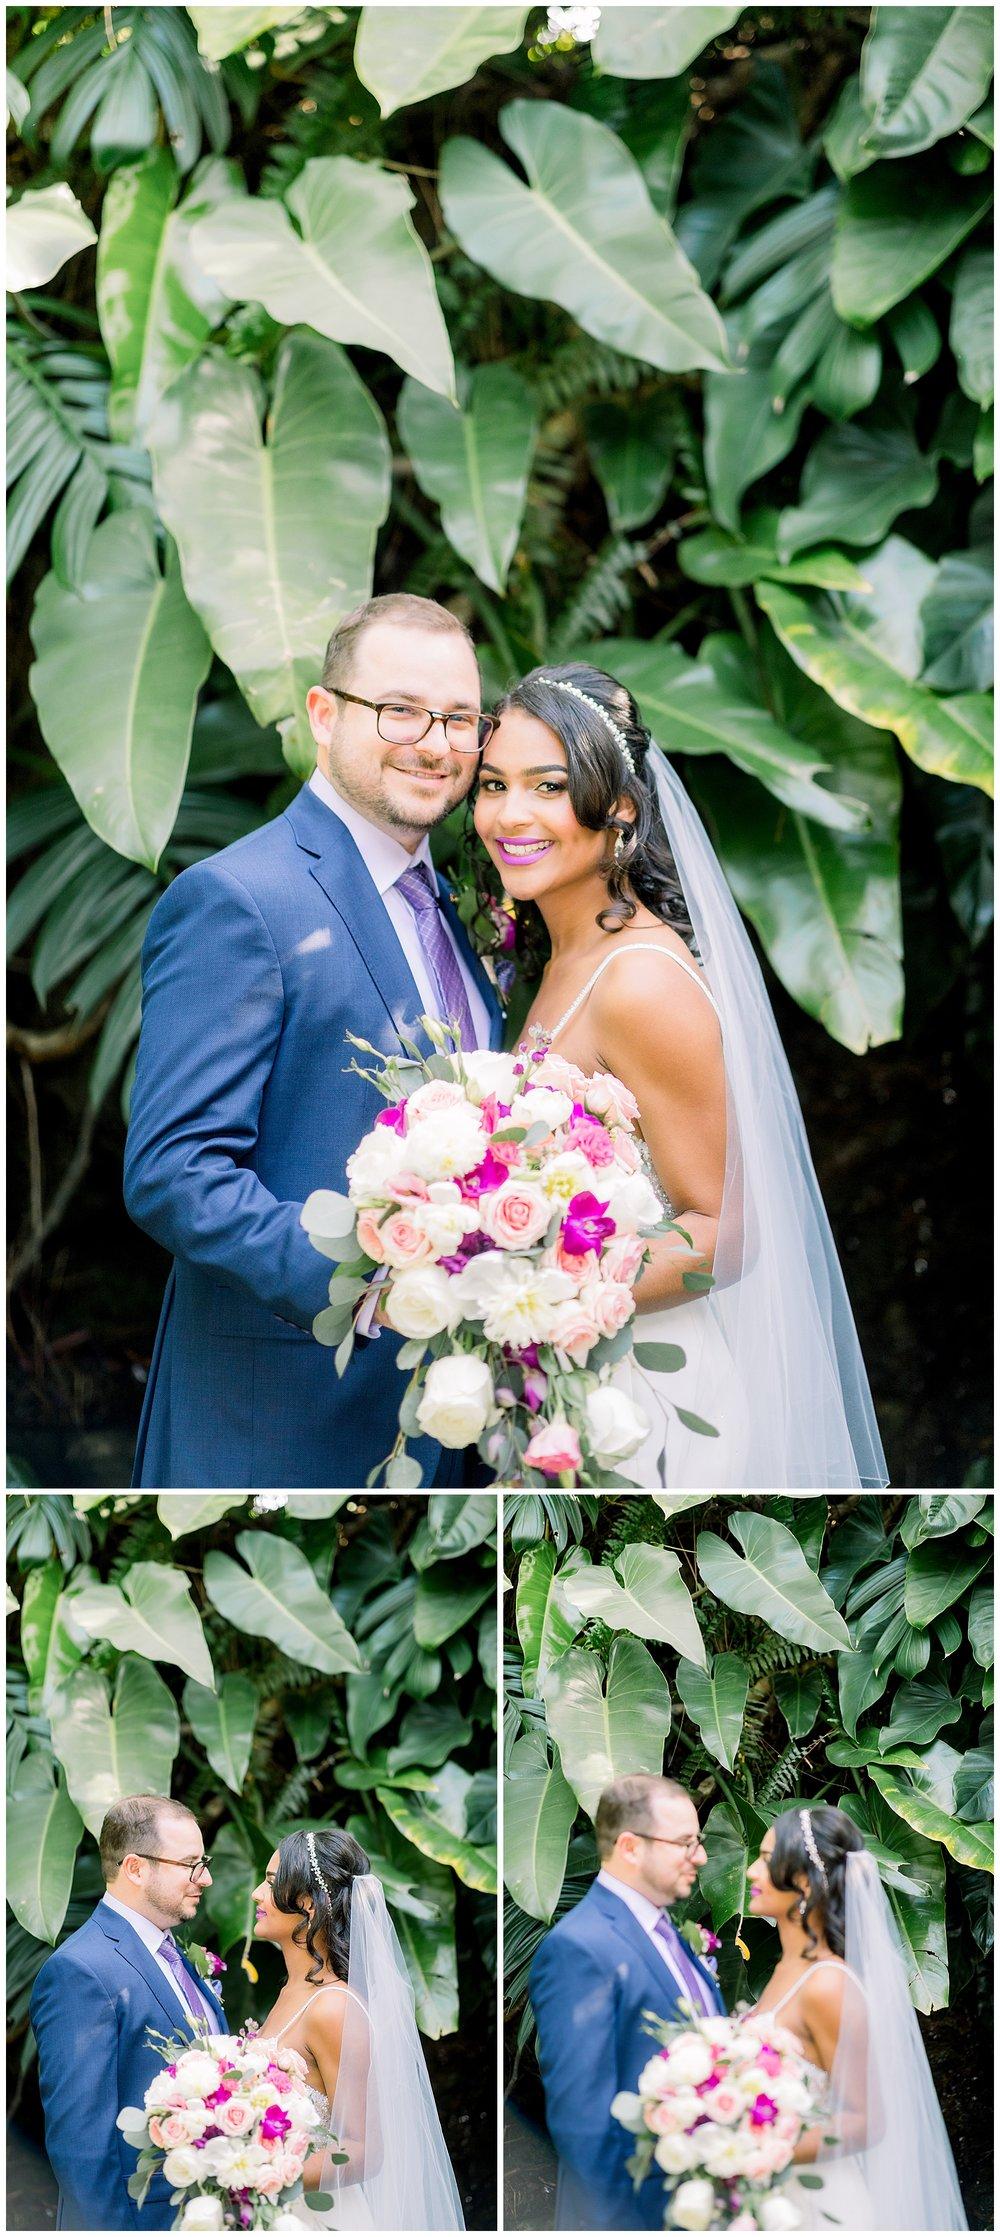 jessicafredericks_lakeland_tampa_wedding_purple_crazy hour_0019.jpg